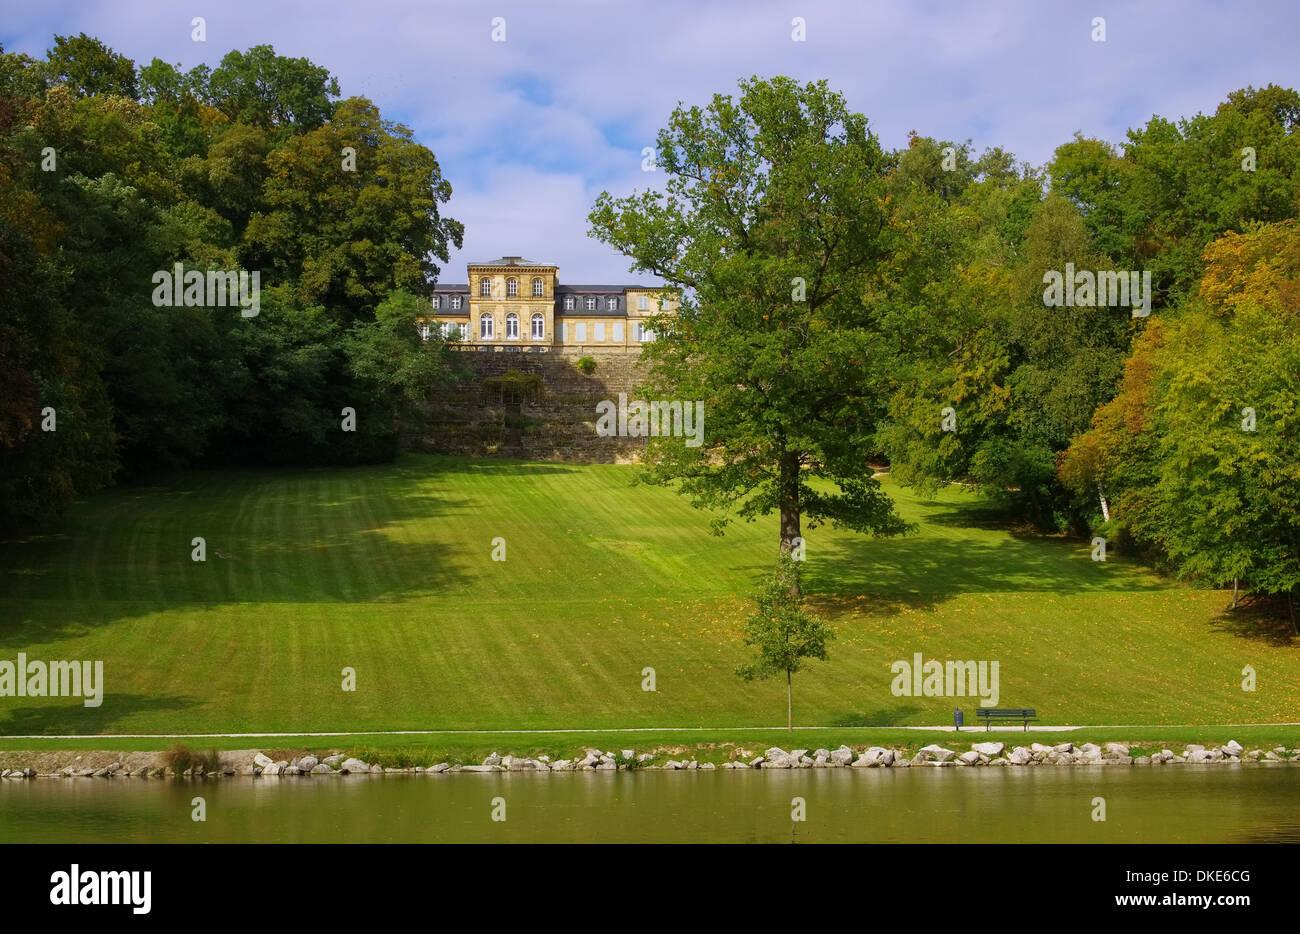 Bayreuth Schloss Fantaisie - Bayreuth Palace Fantaisie 04 - Stock Image